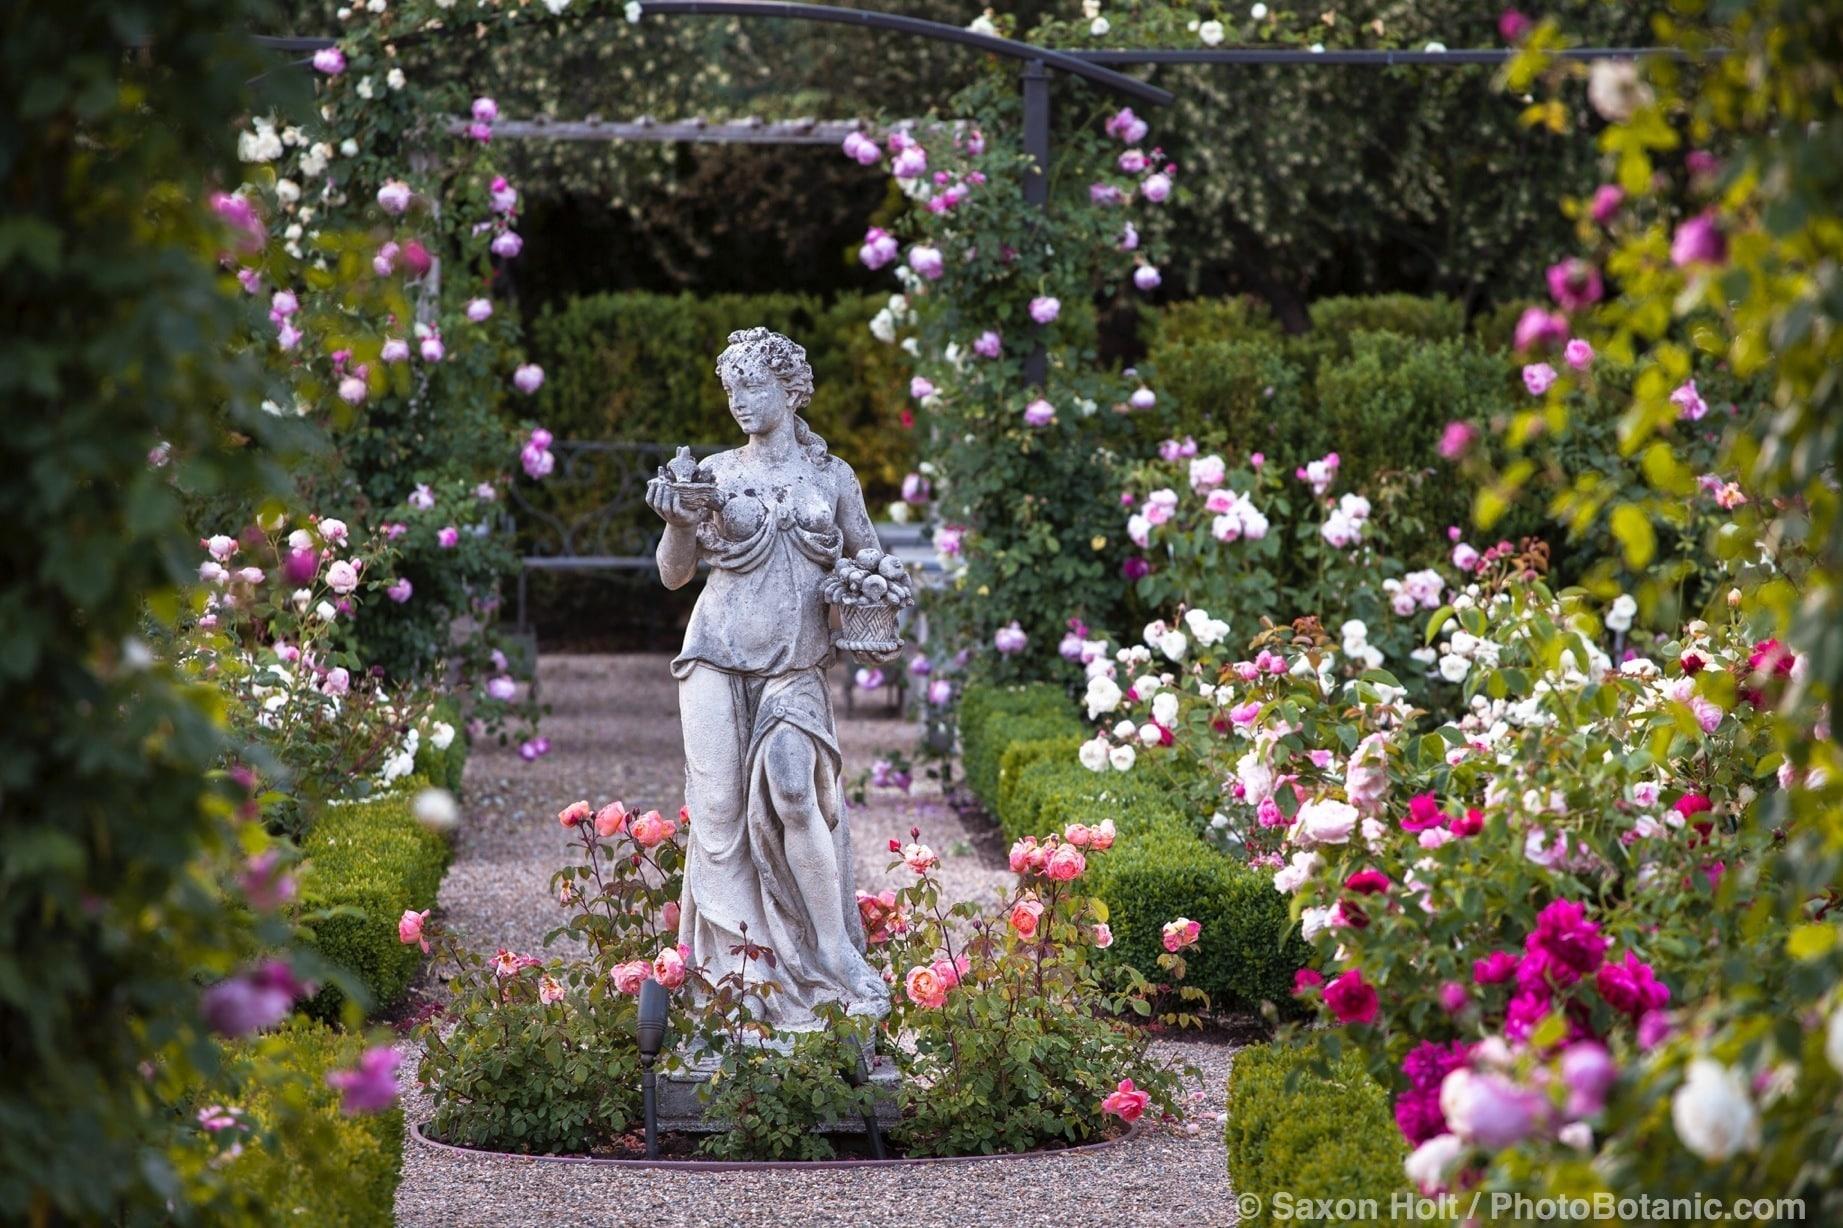 Statue of classical woman as focal point in axis of rose garden; Magowan garden